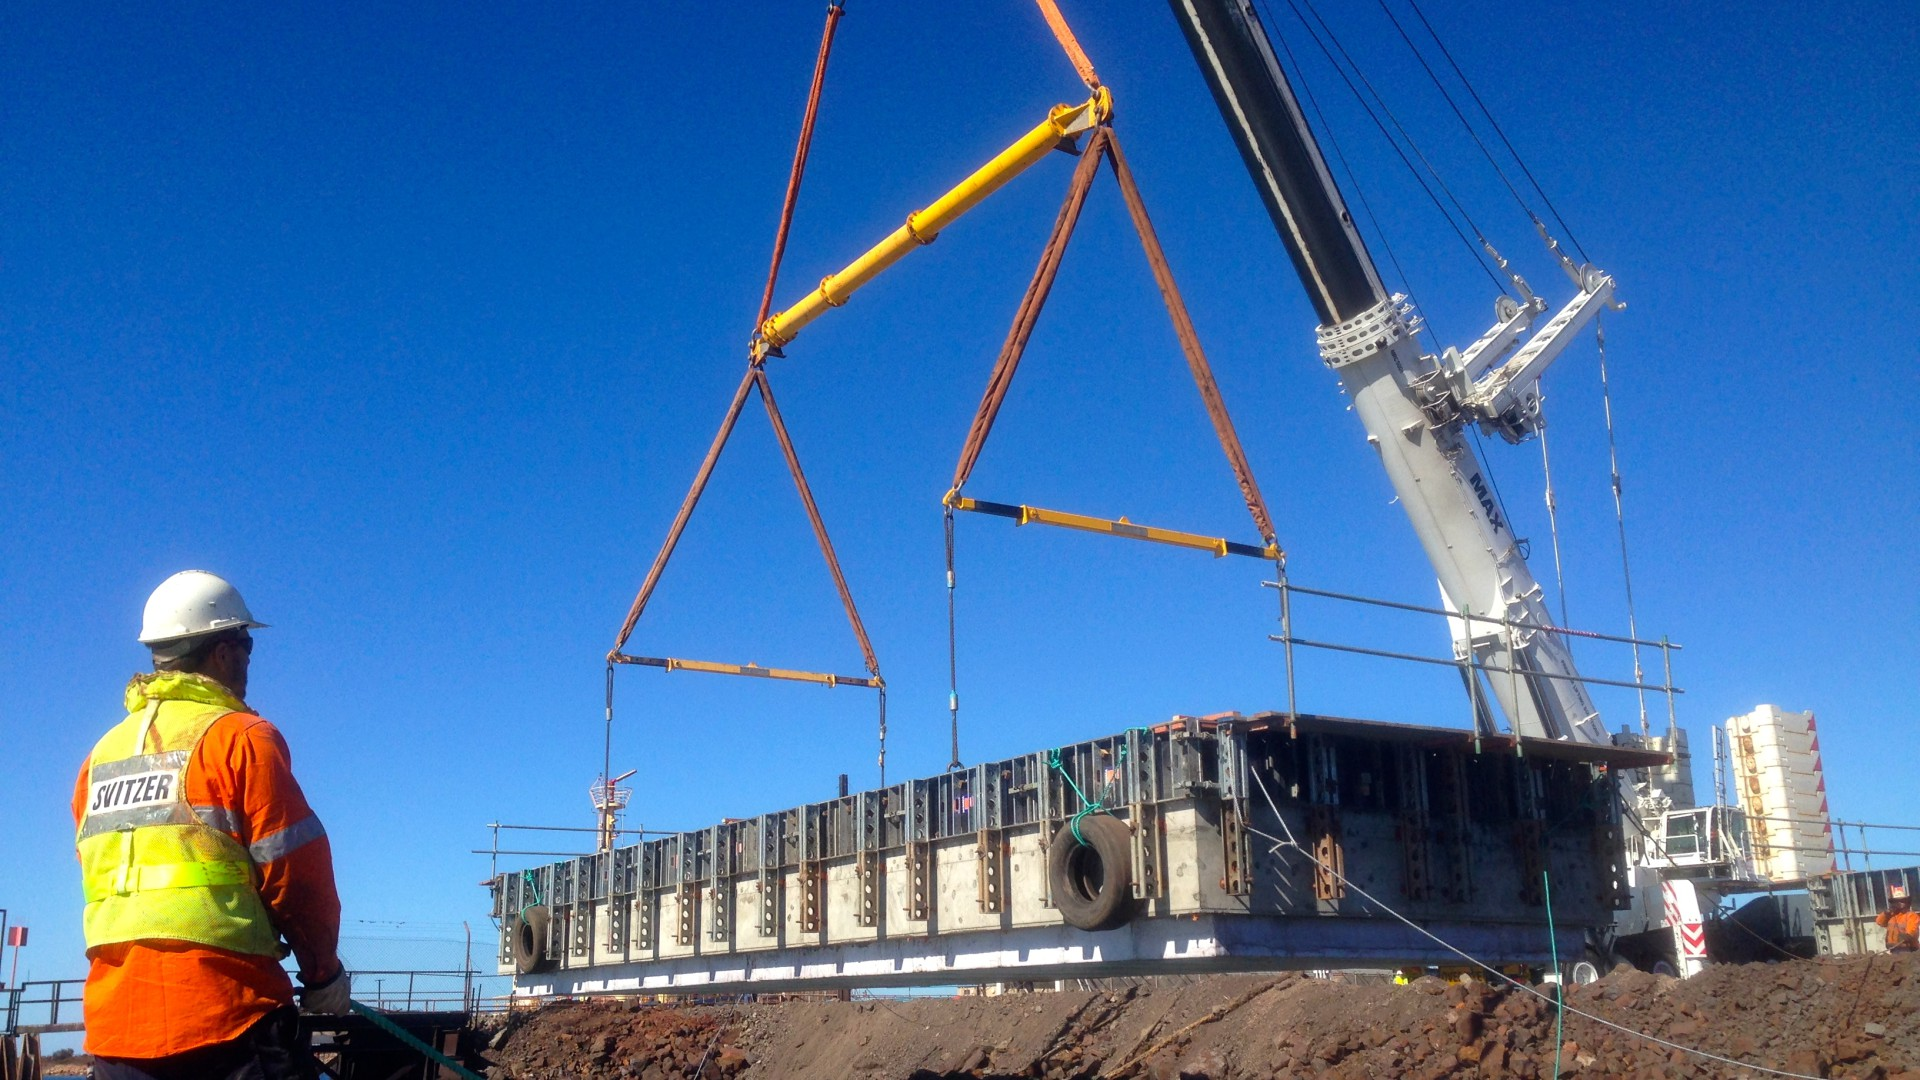 Lifting 20m x 6m concrete pontoon into water, South Australia